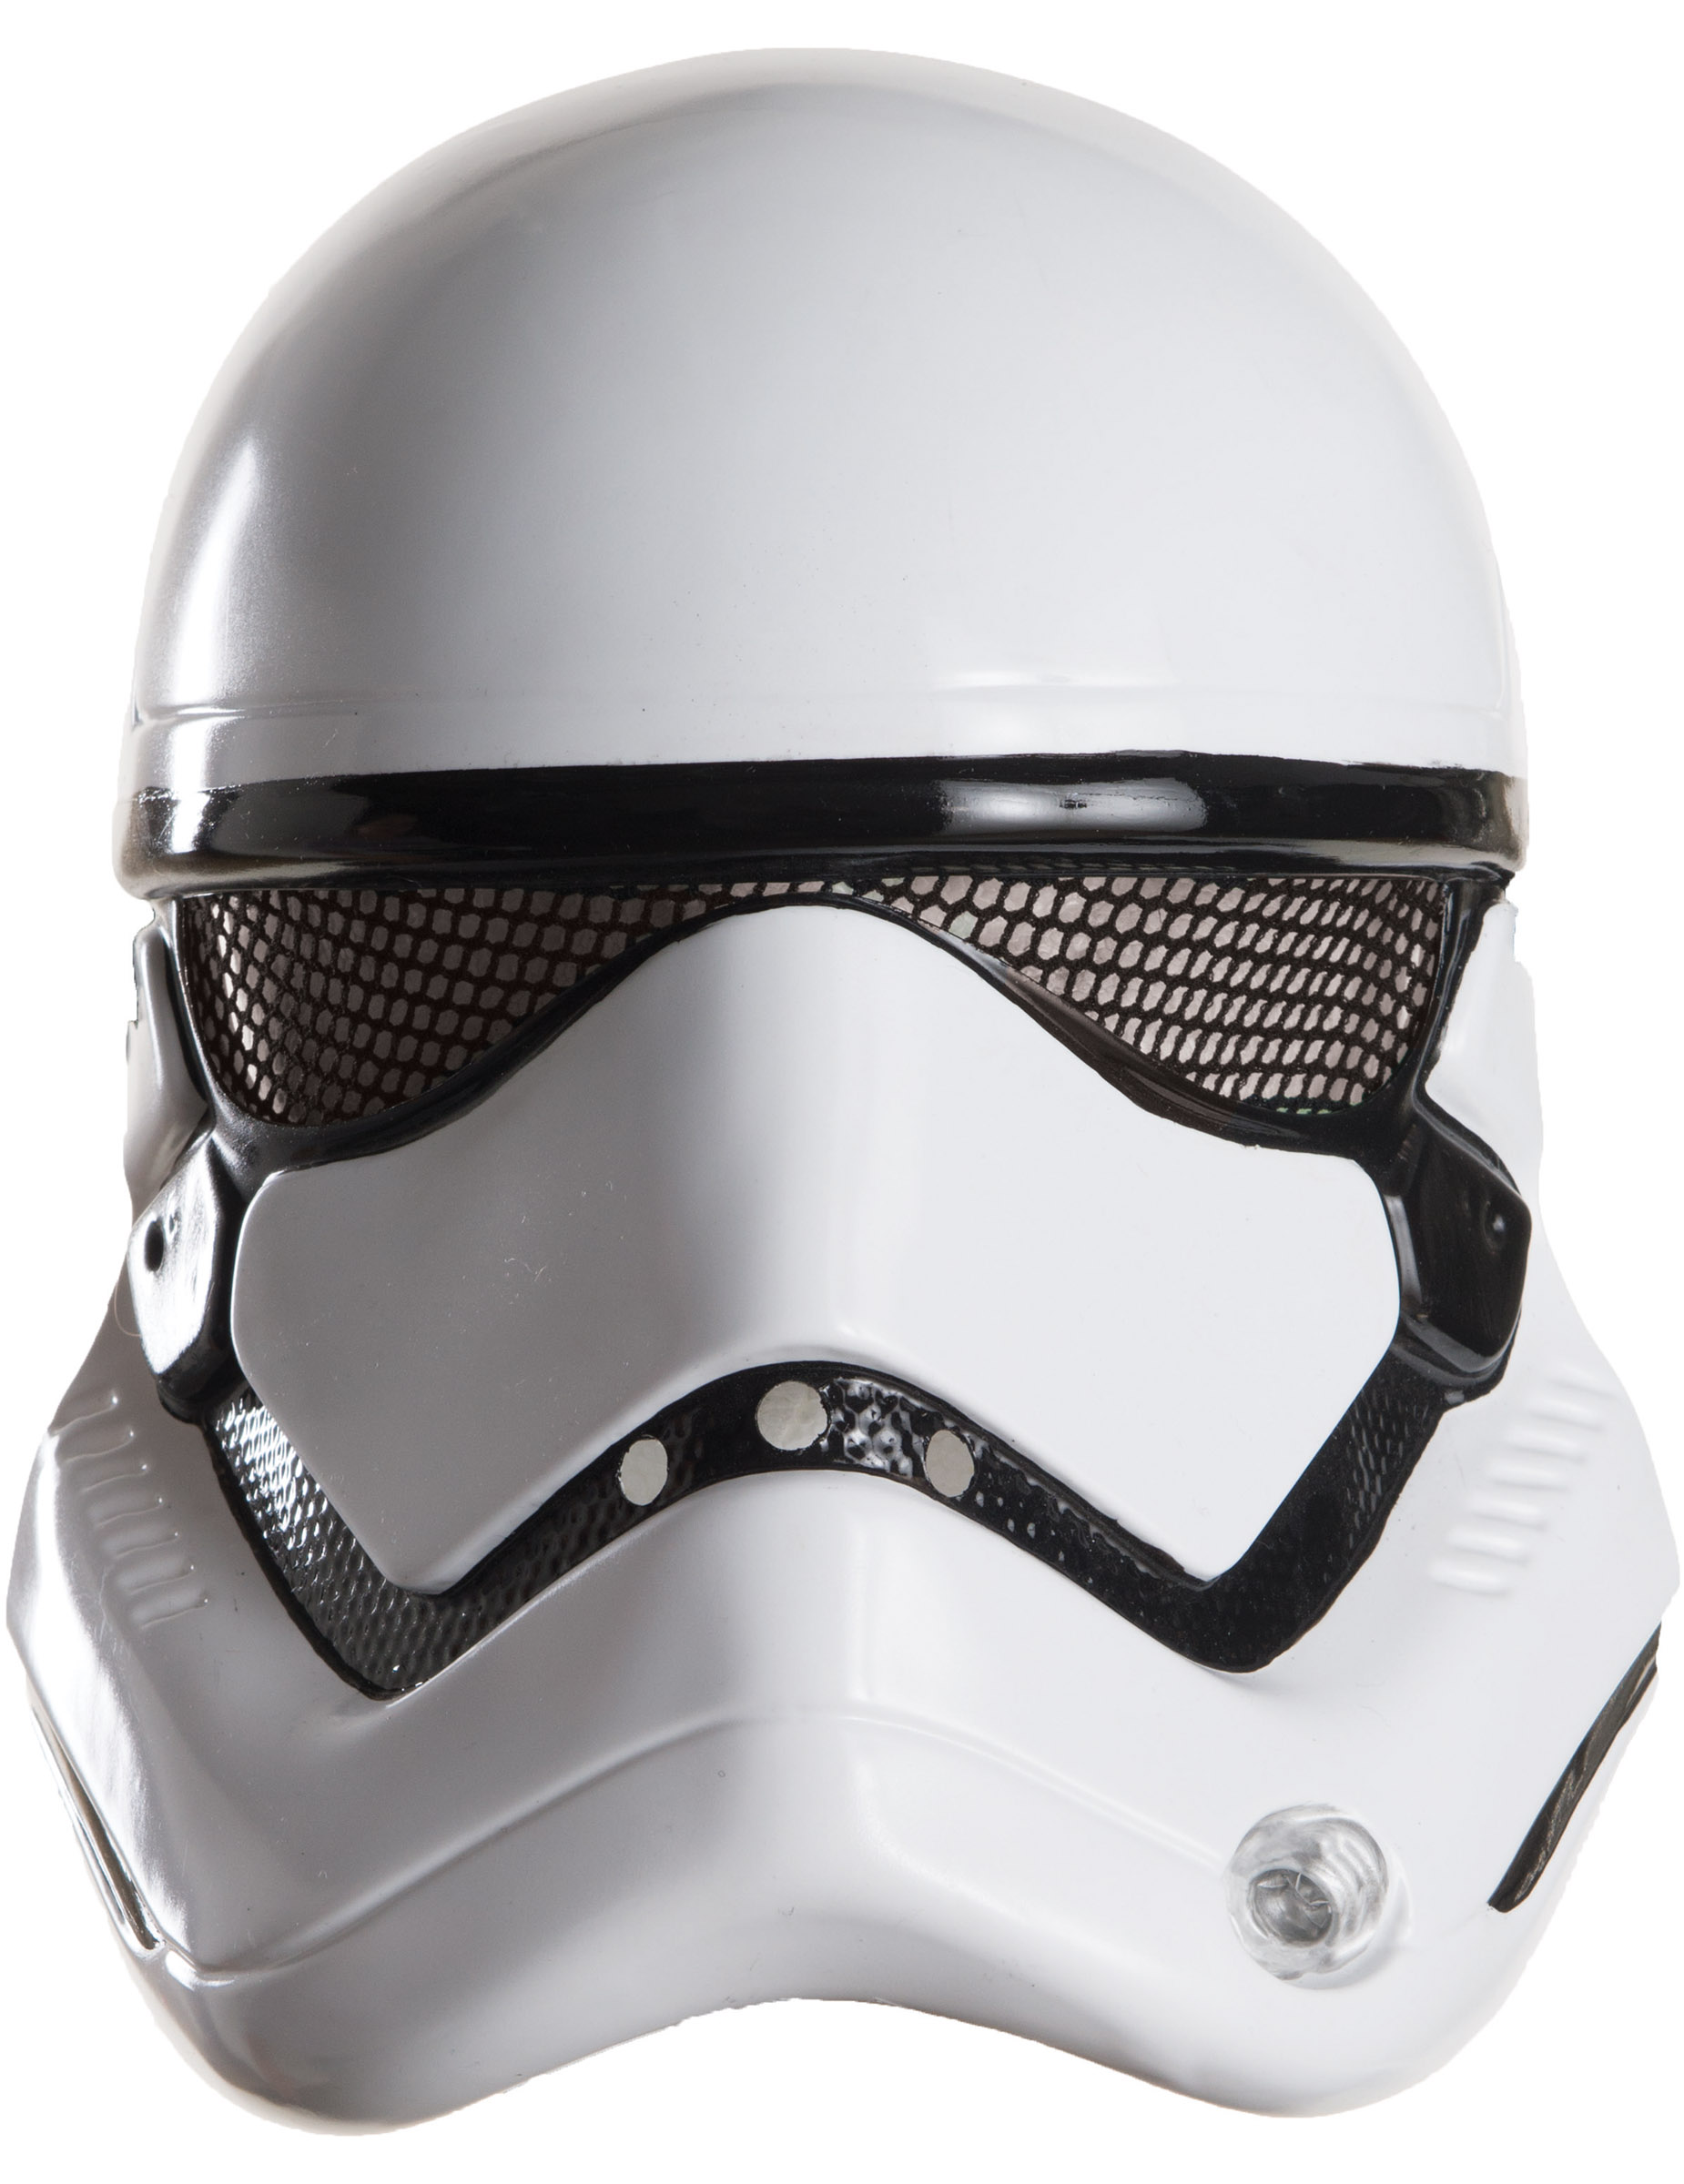 Generique Masque Casque 2 pi/èces Flametrooper Star Wars VII Adulte